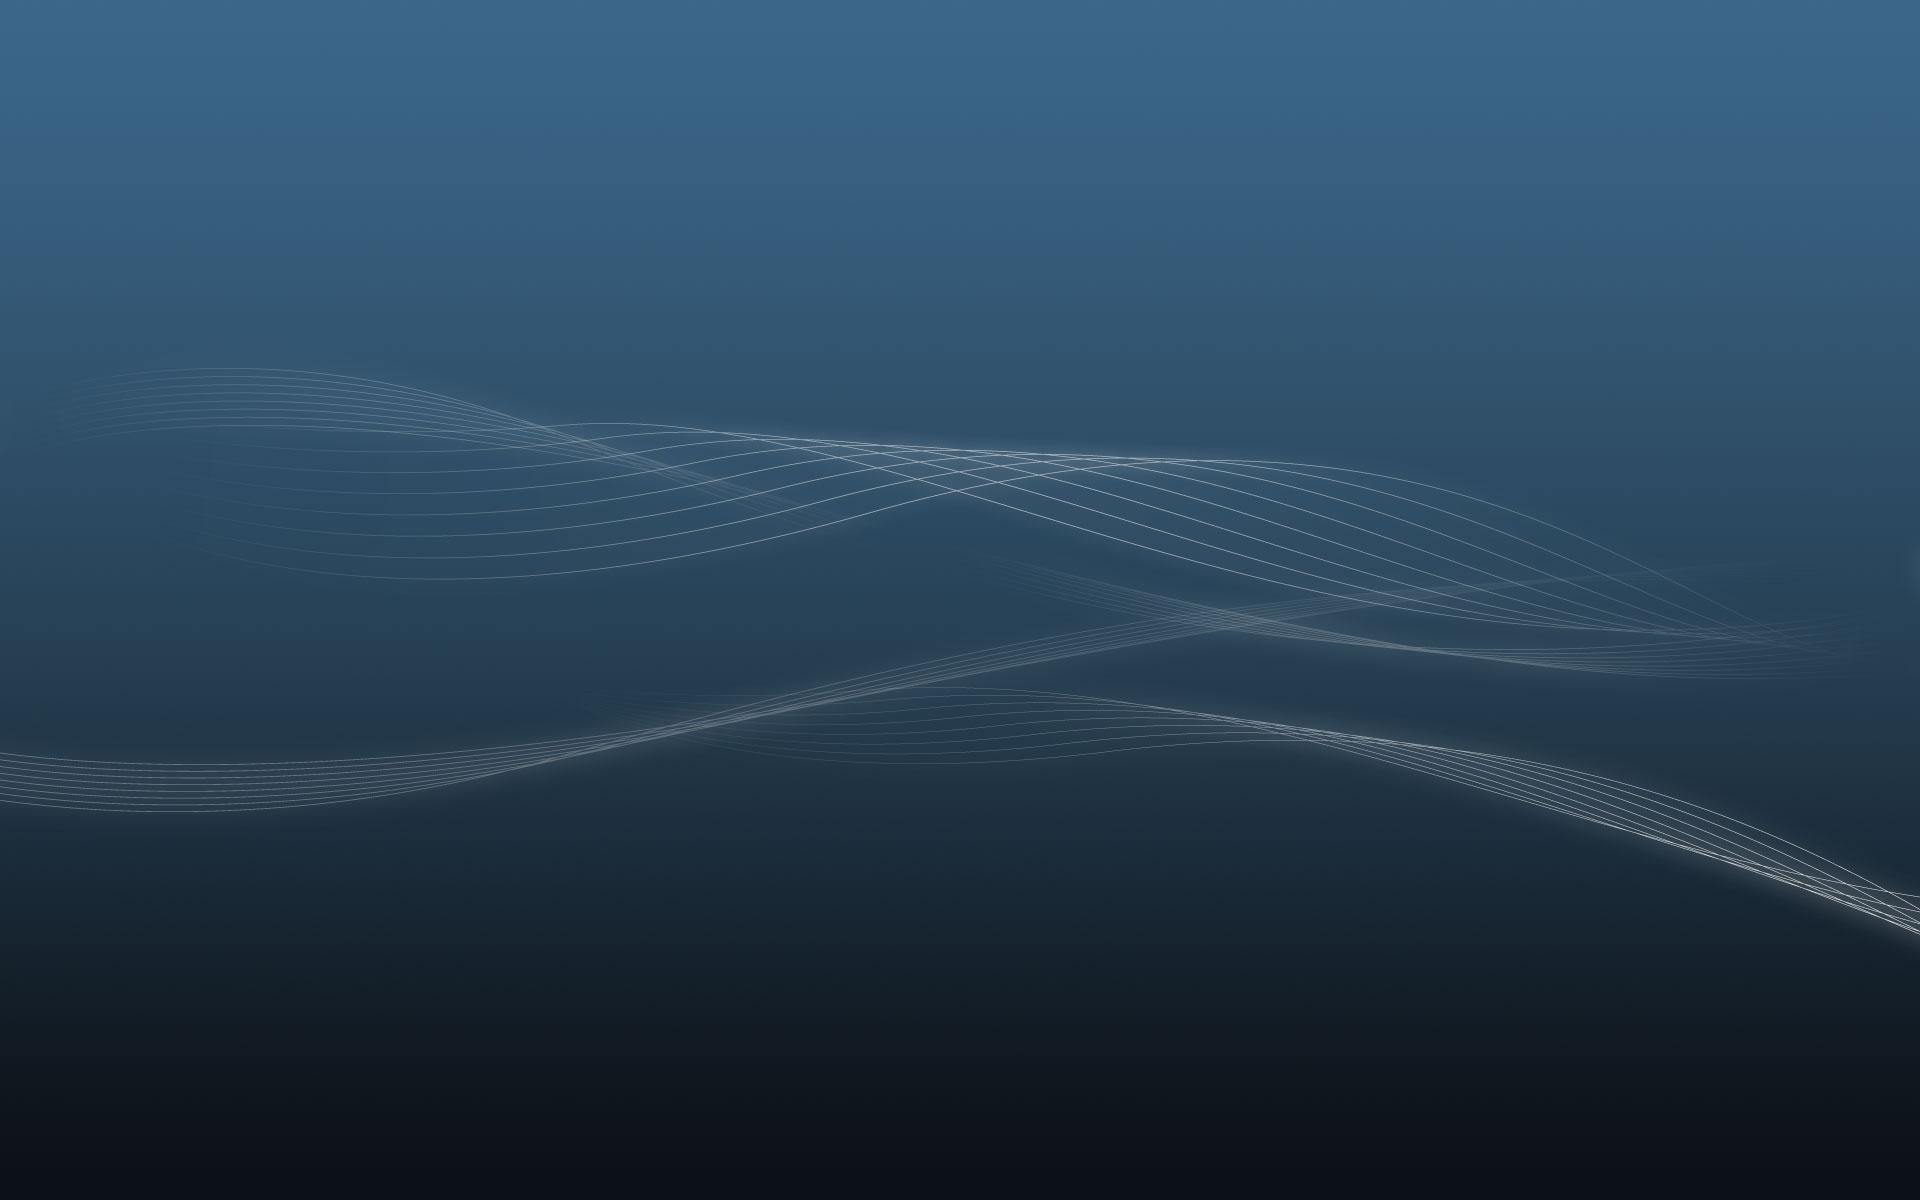 microsoft desktop backgrounds wallpaper 136364